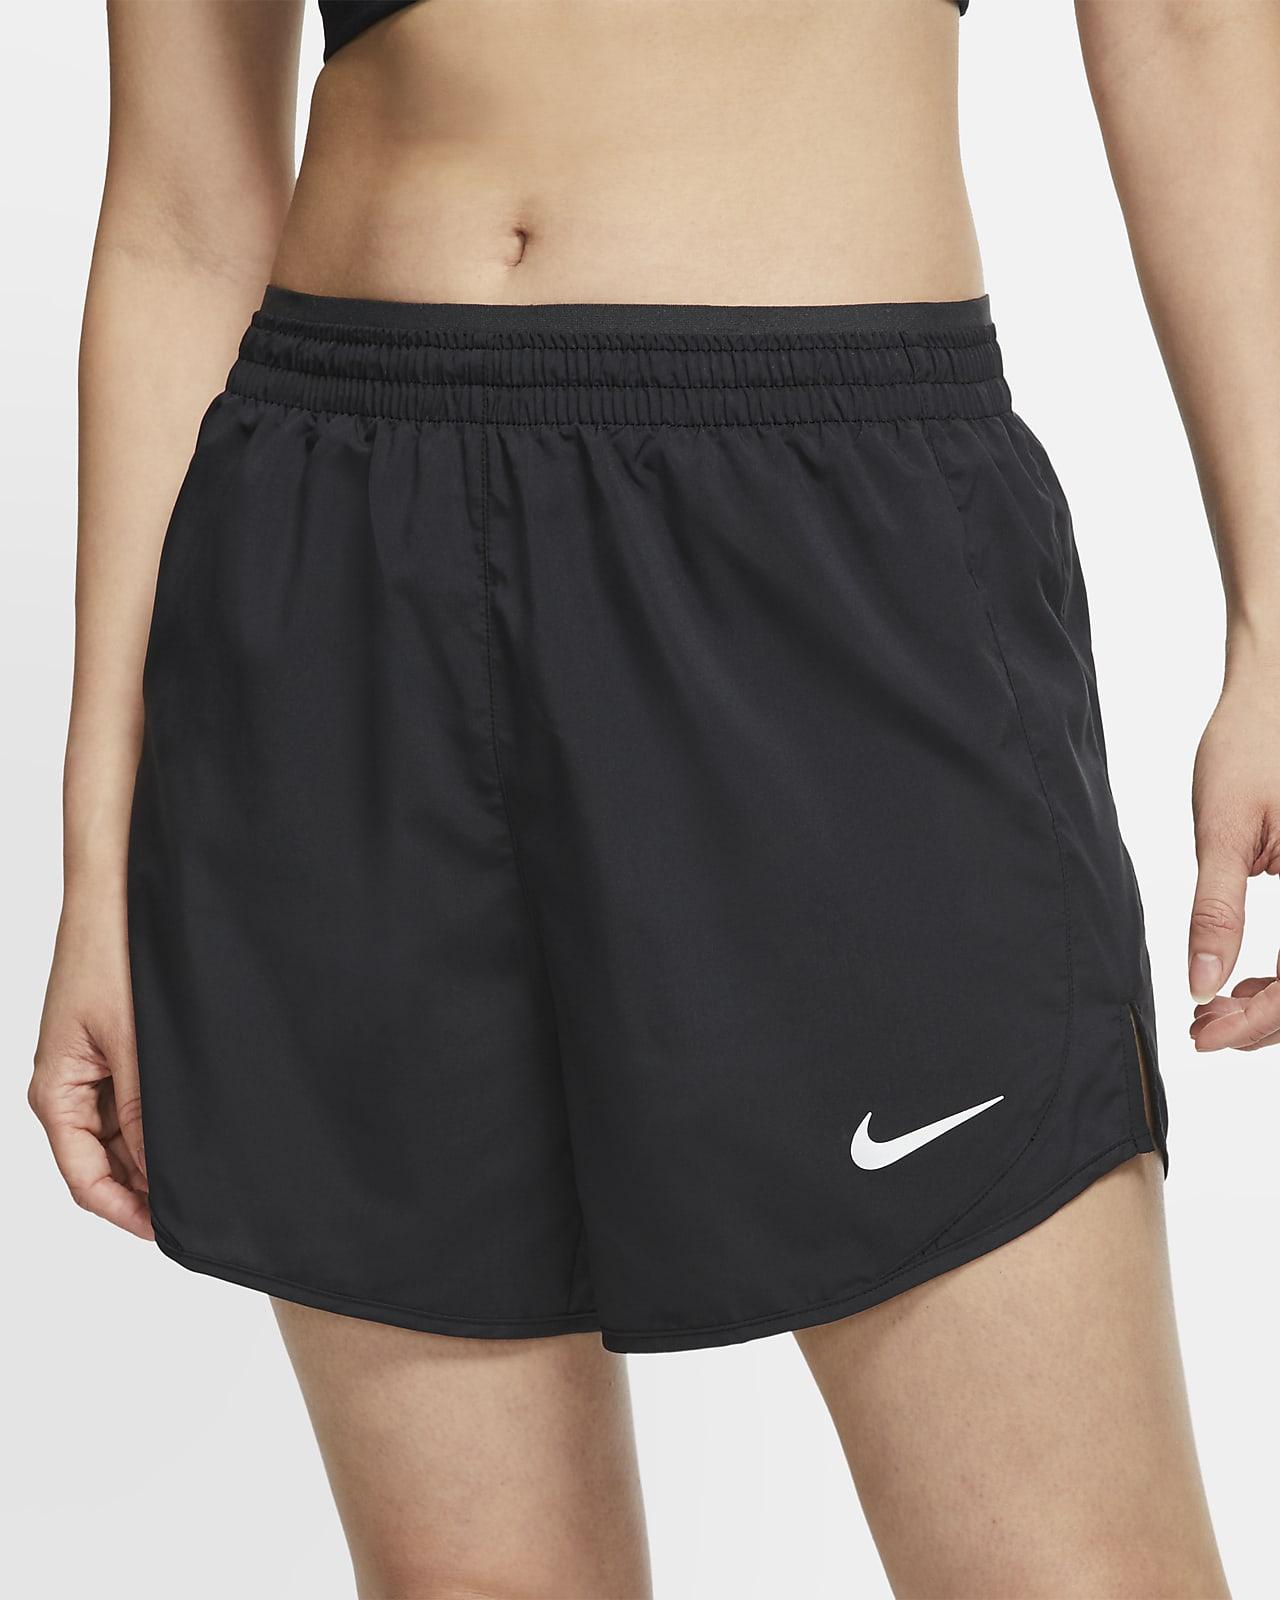 Short de running Nike Tempo Luxe pour Femme